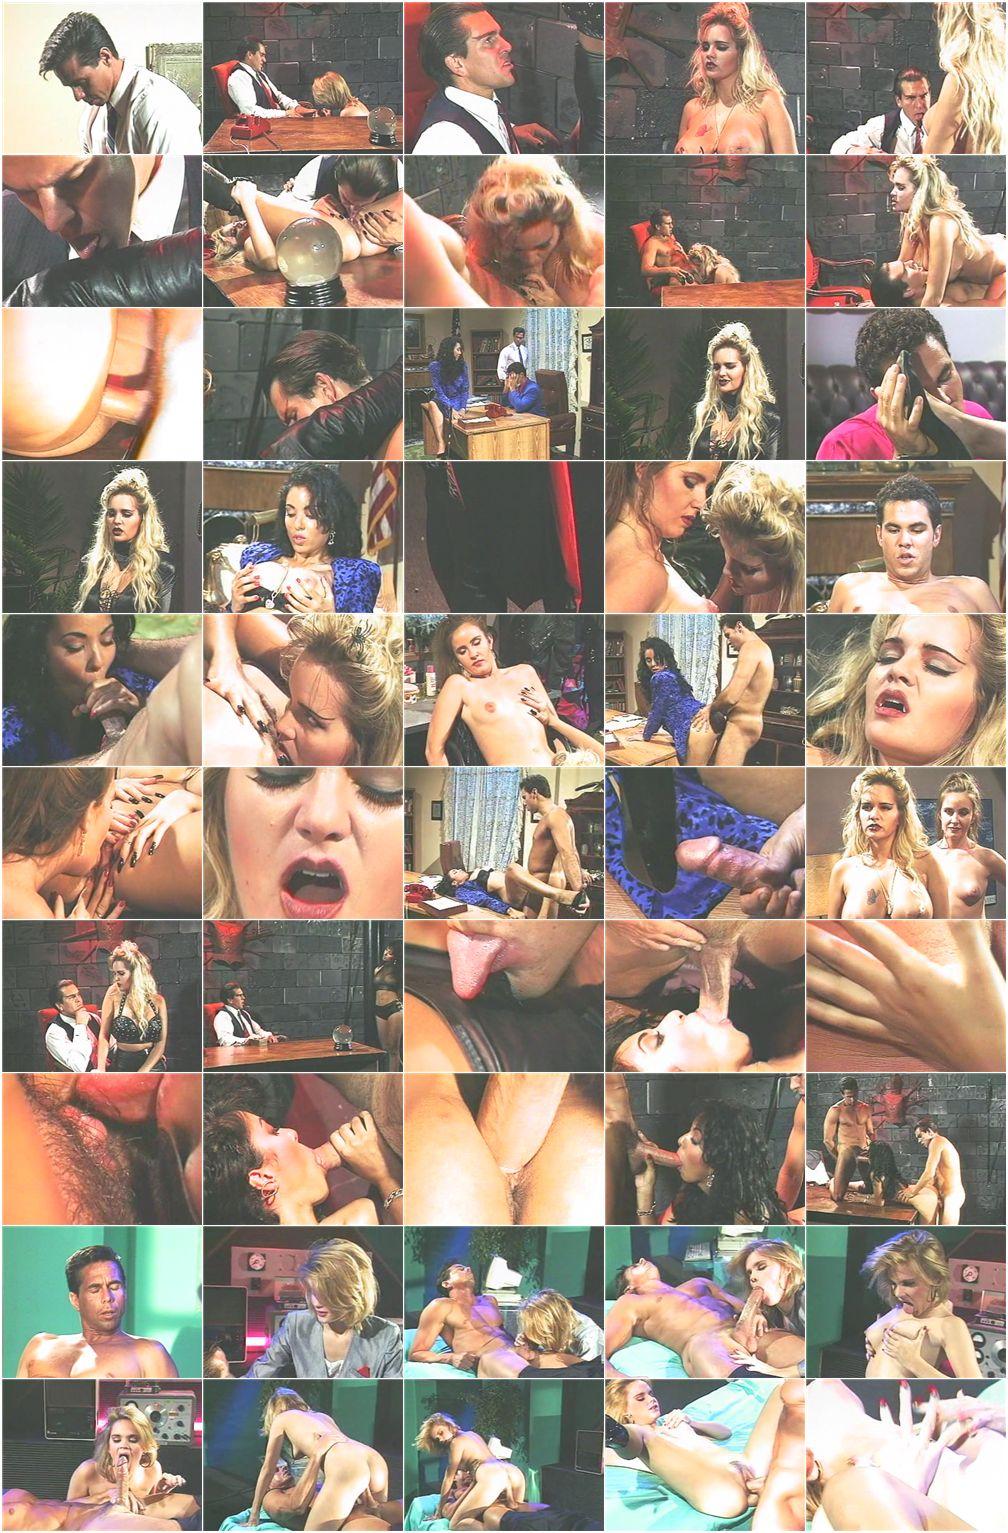 erotika-filmi-2000-h